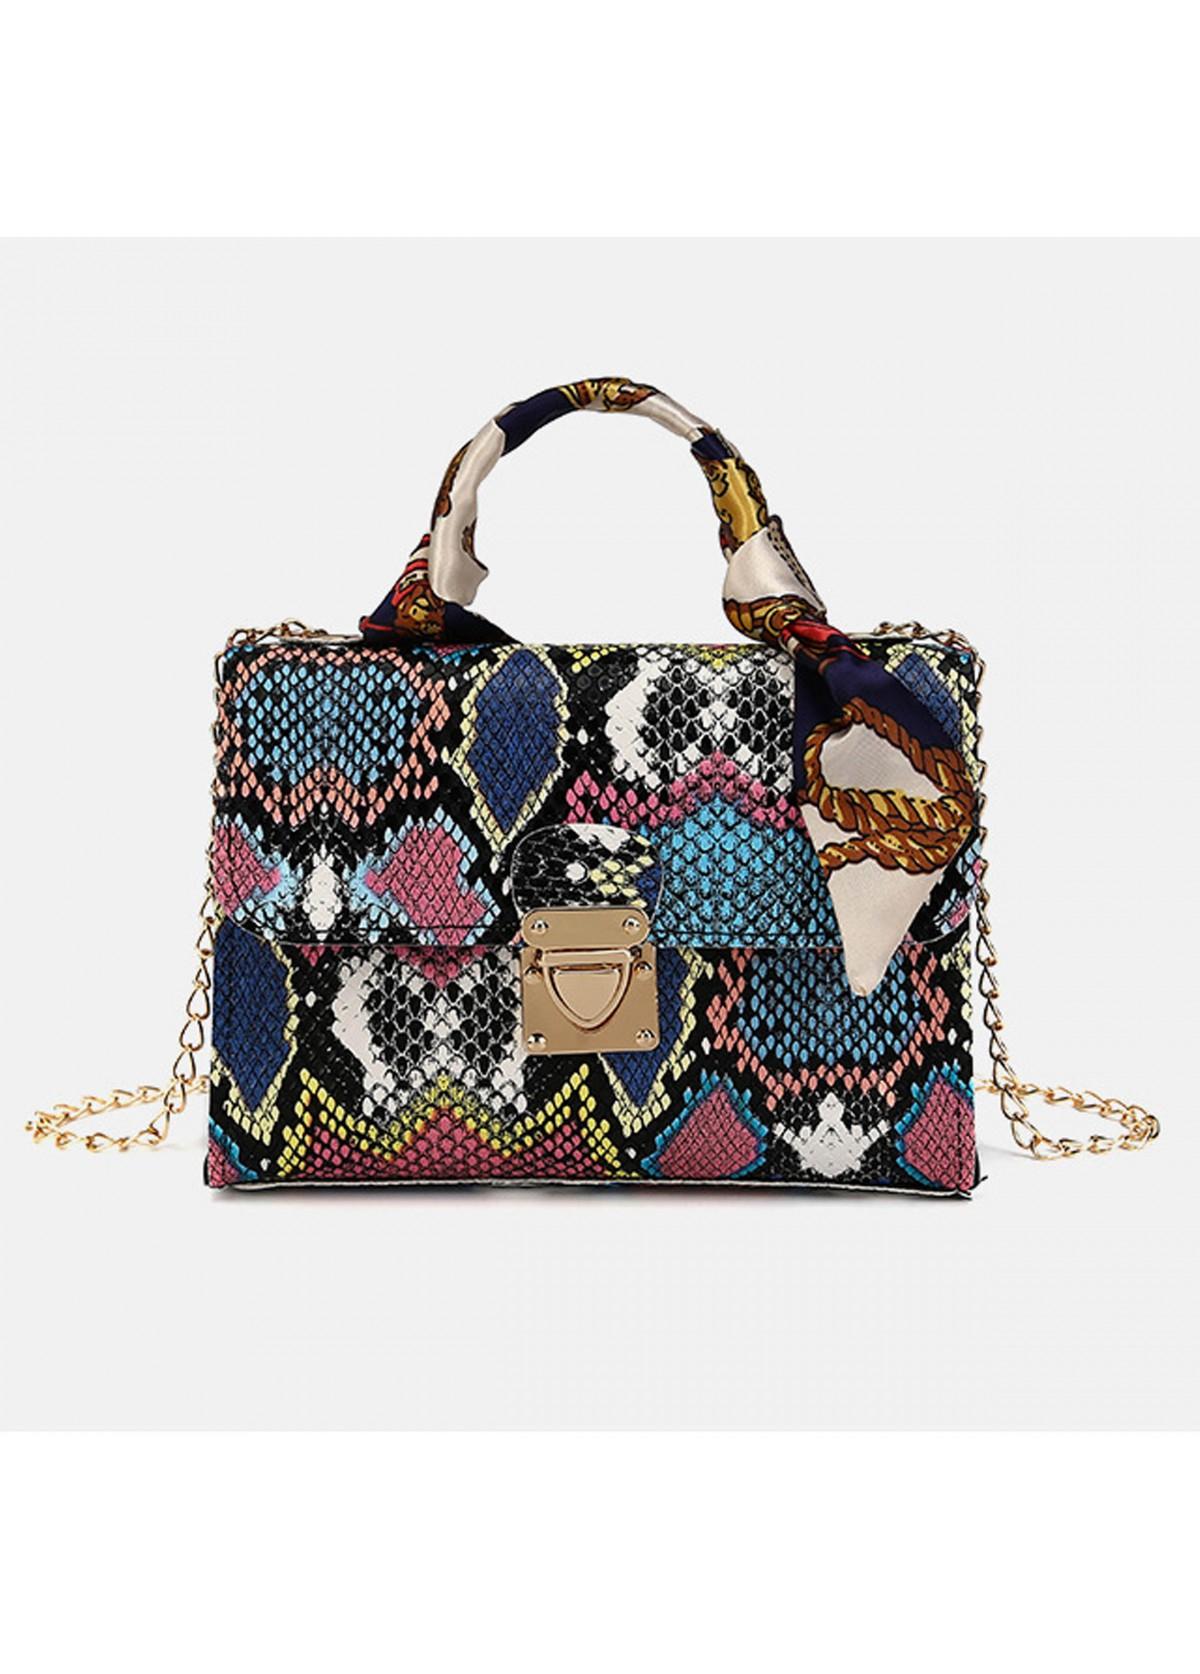 Gold Chain Snake Print PU CrossBody Messenger Bag